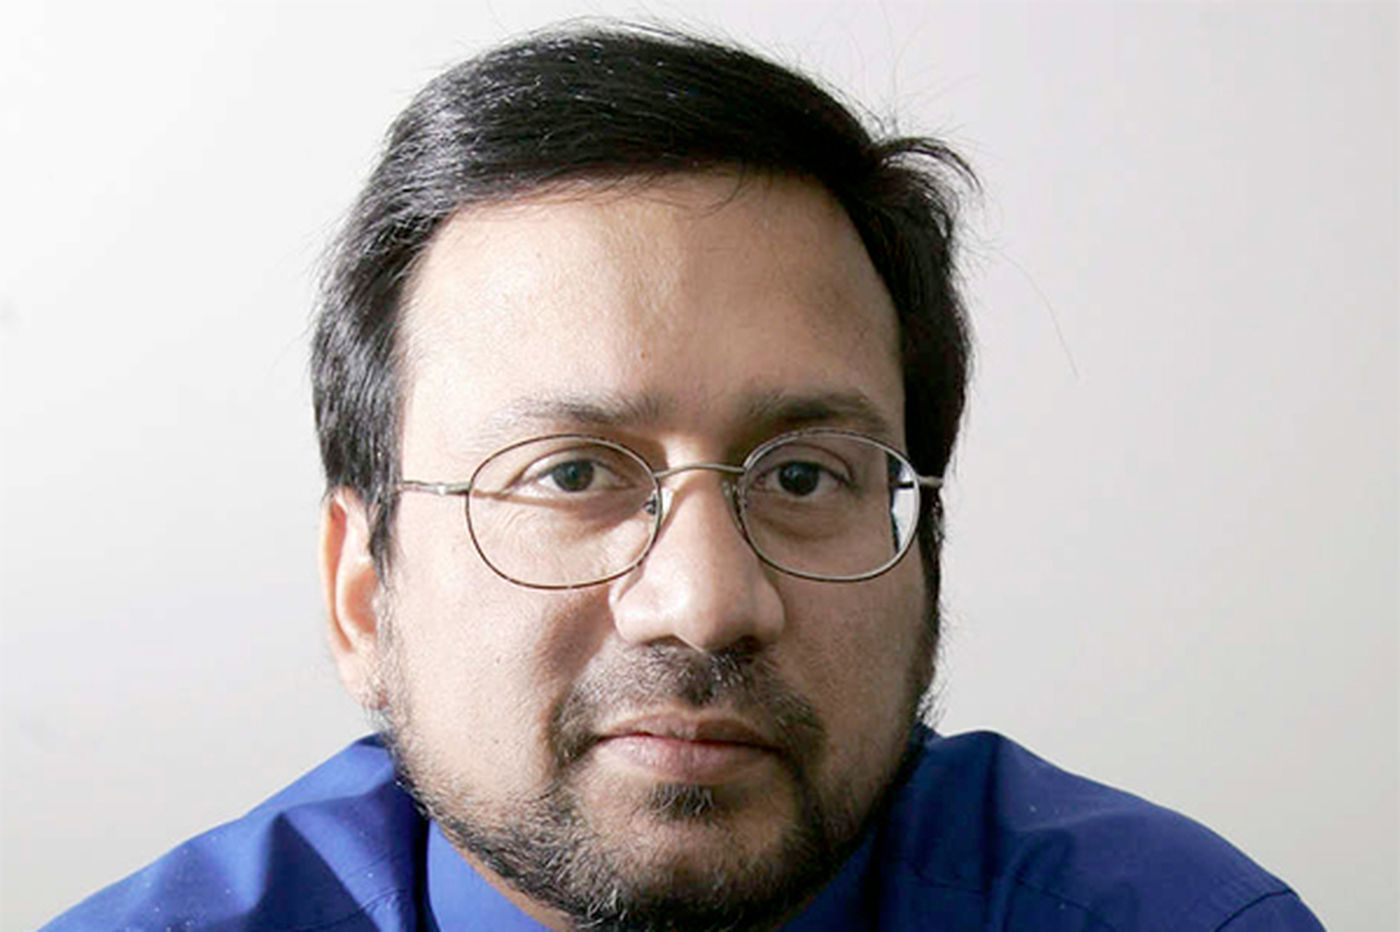 The Pulse: Shock for critics: Muslim judge's non-sharia ruling